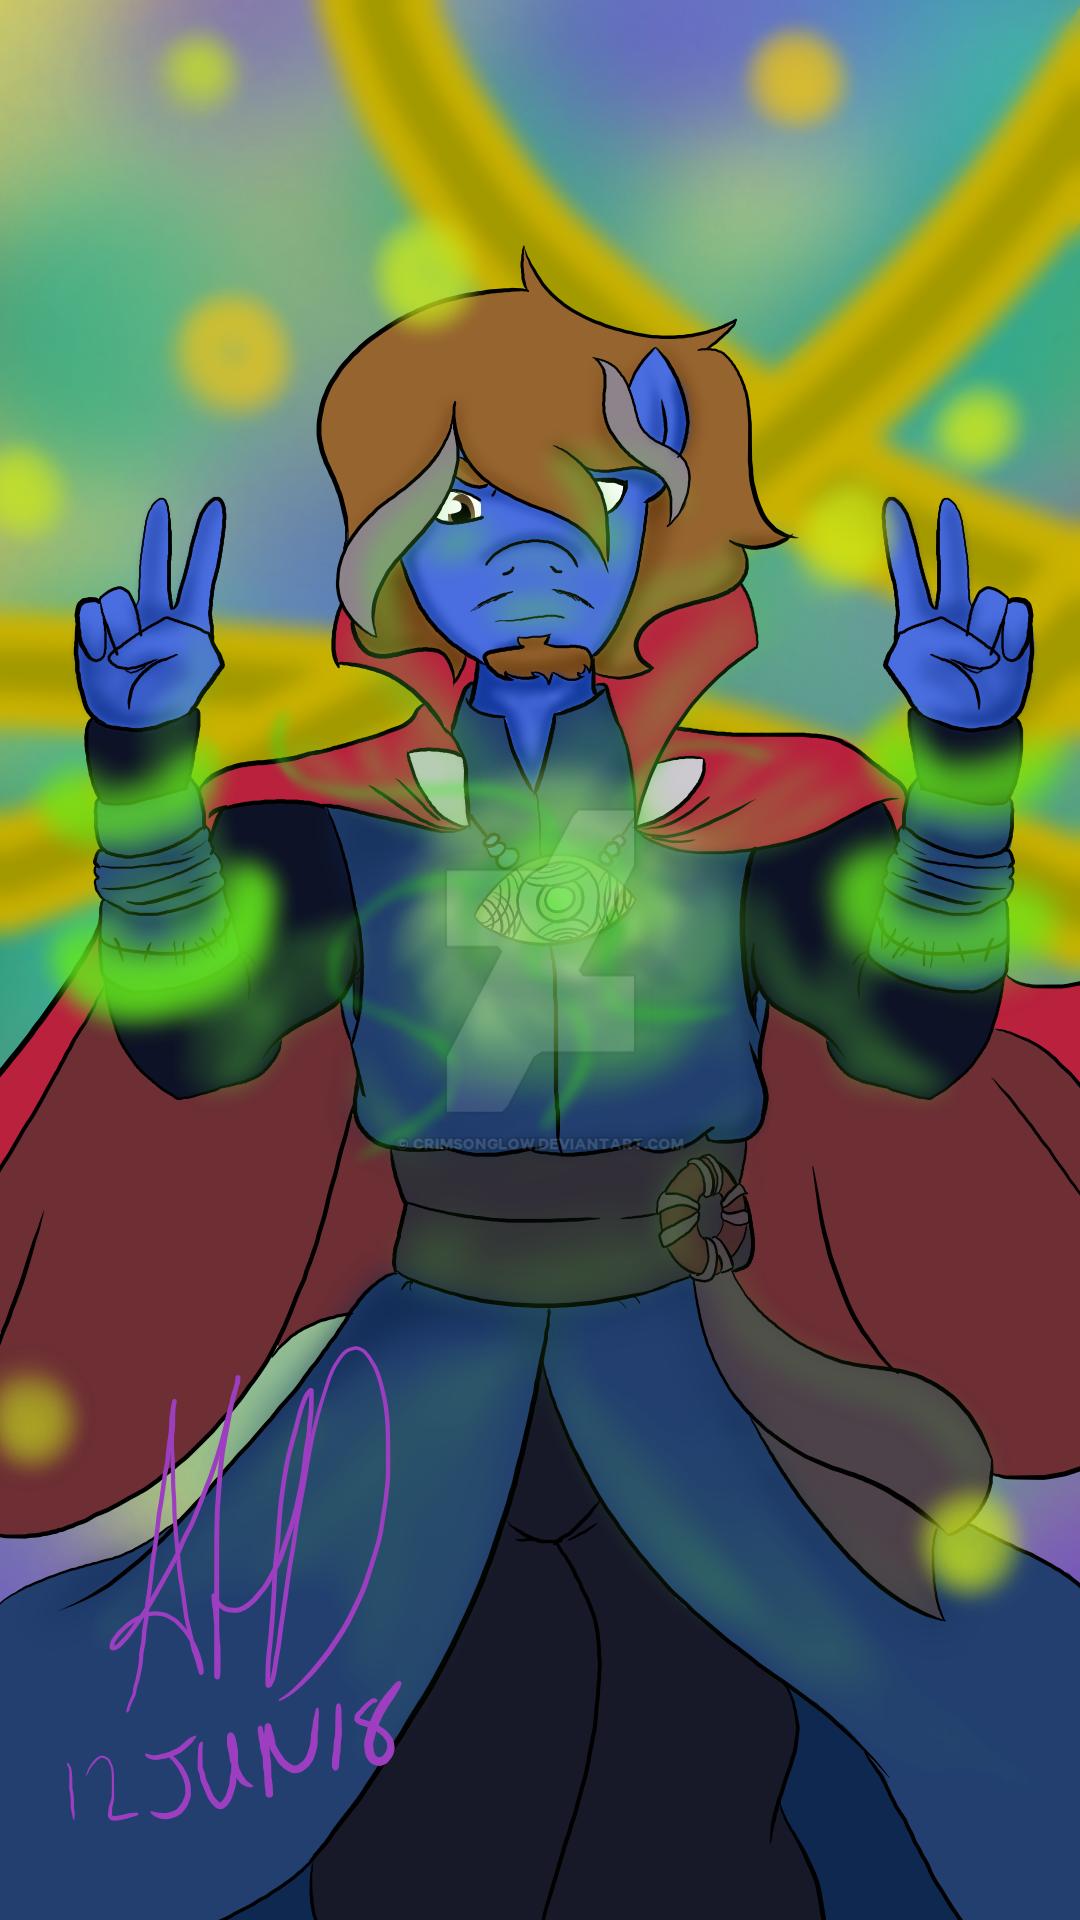 Doctor Gamelink by CrimsonGlow